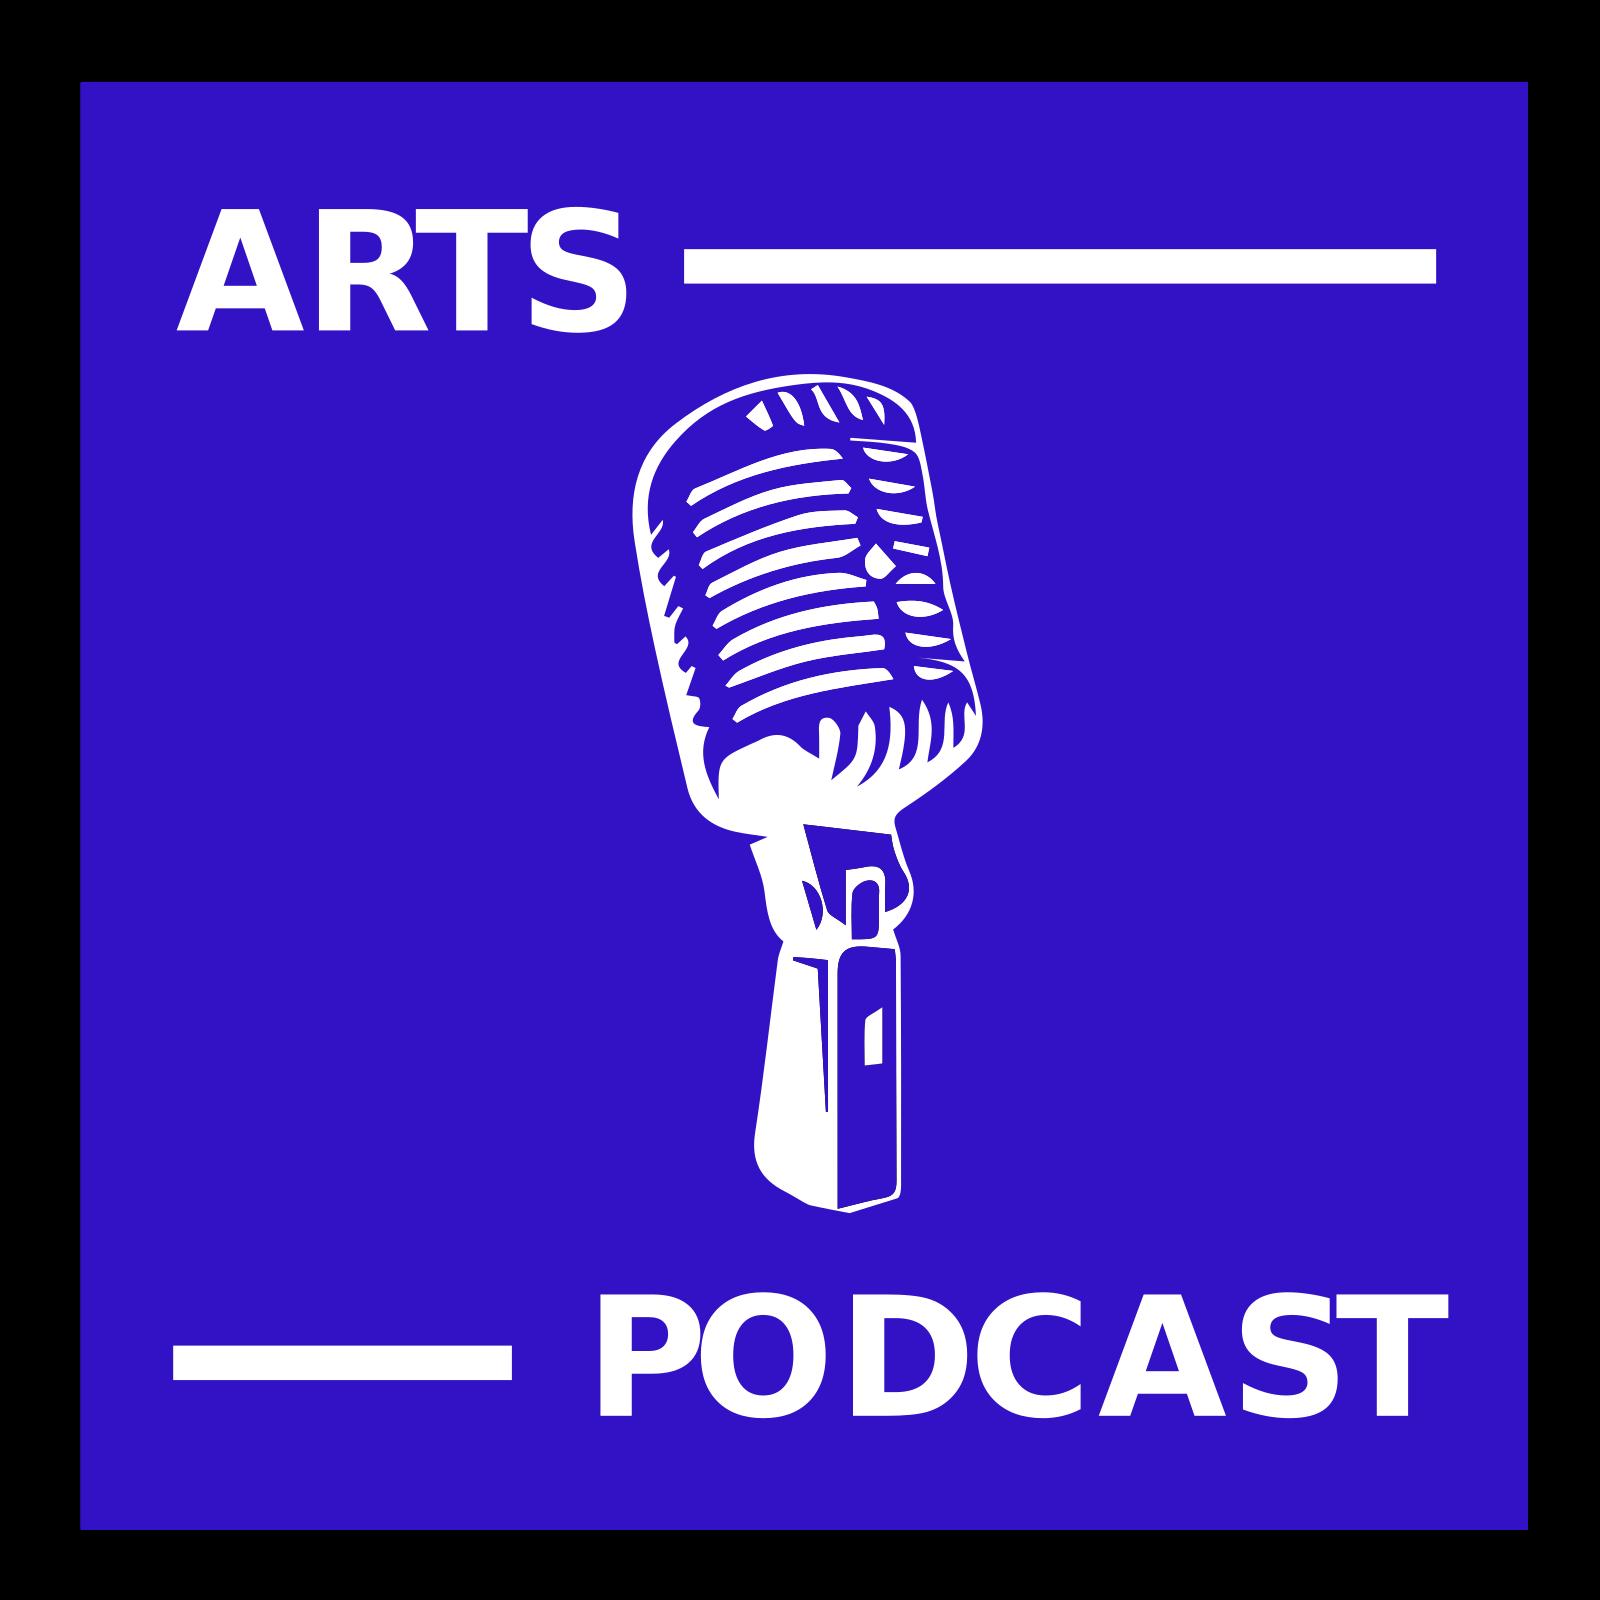 Arts podcast